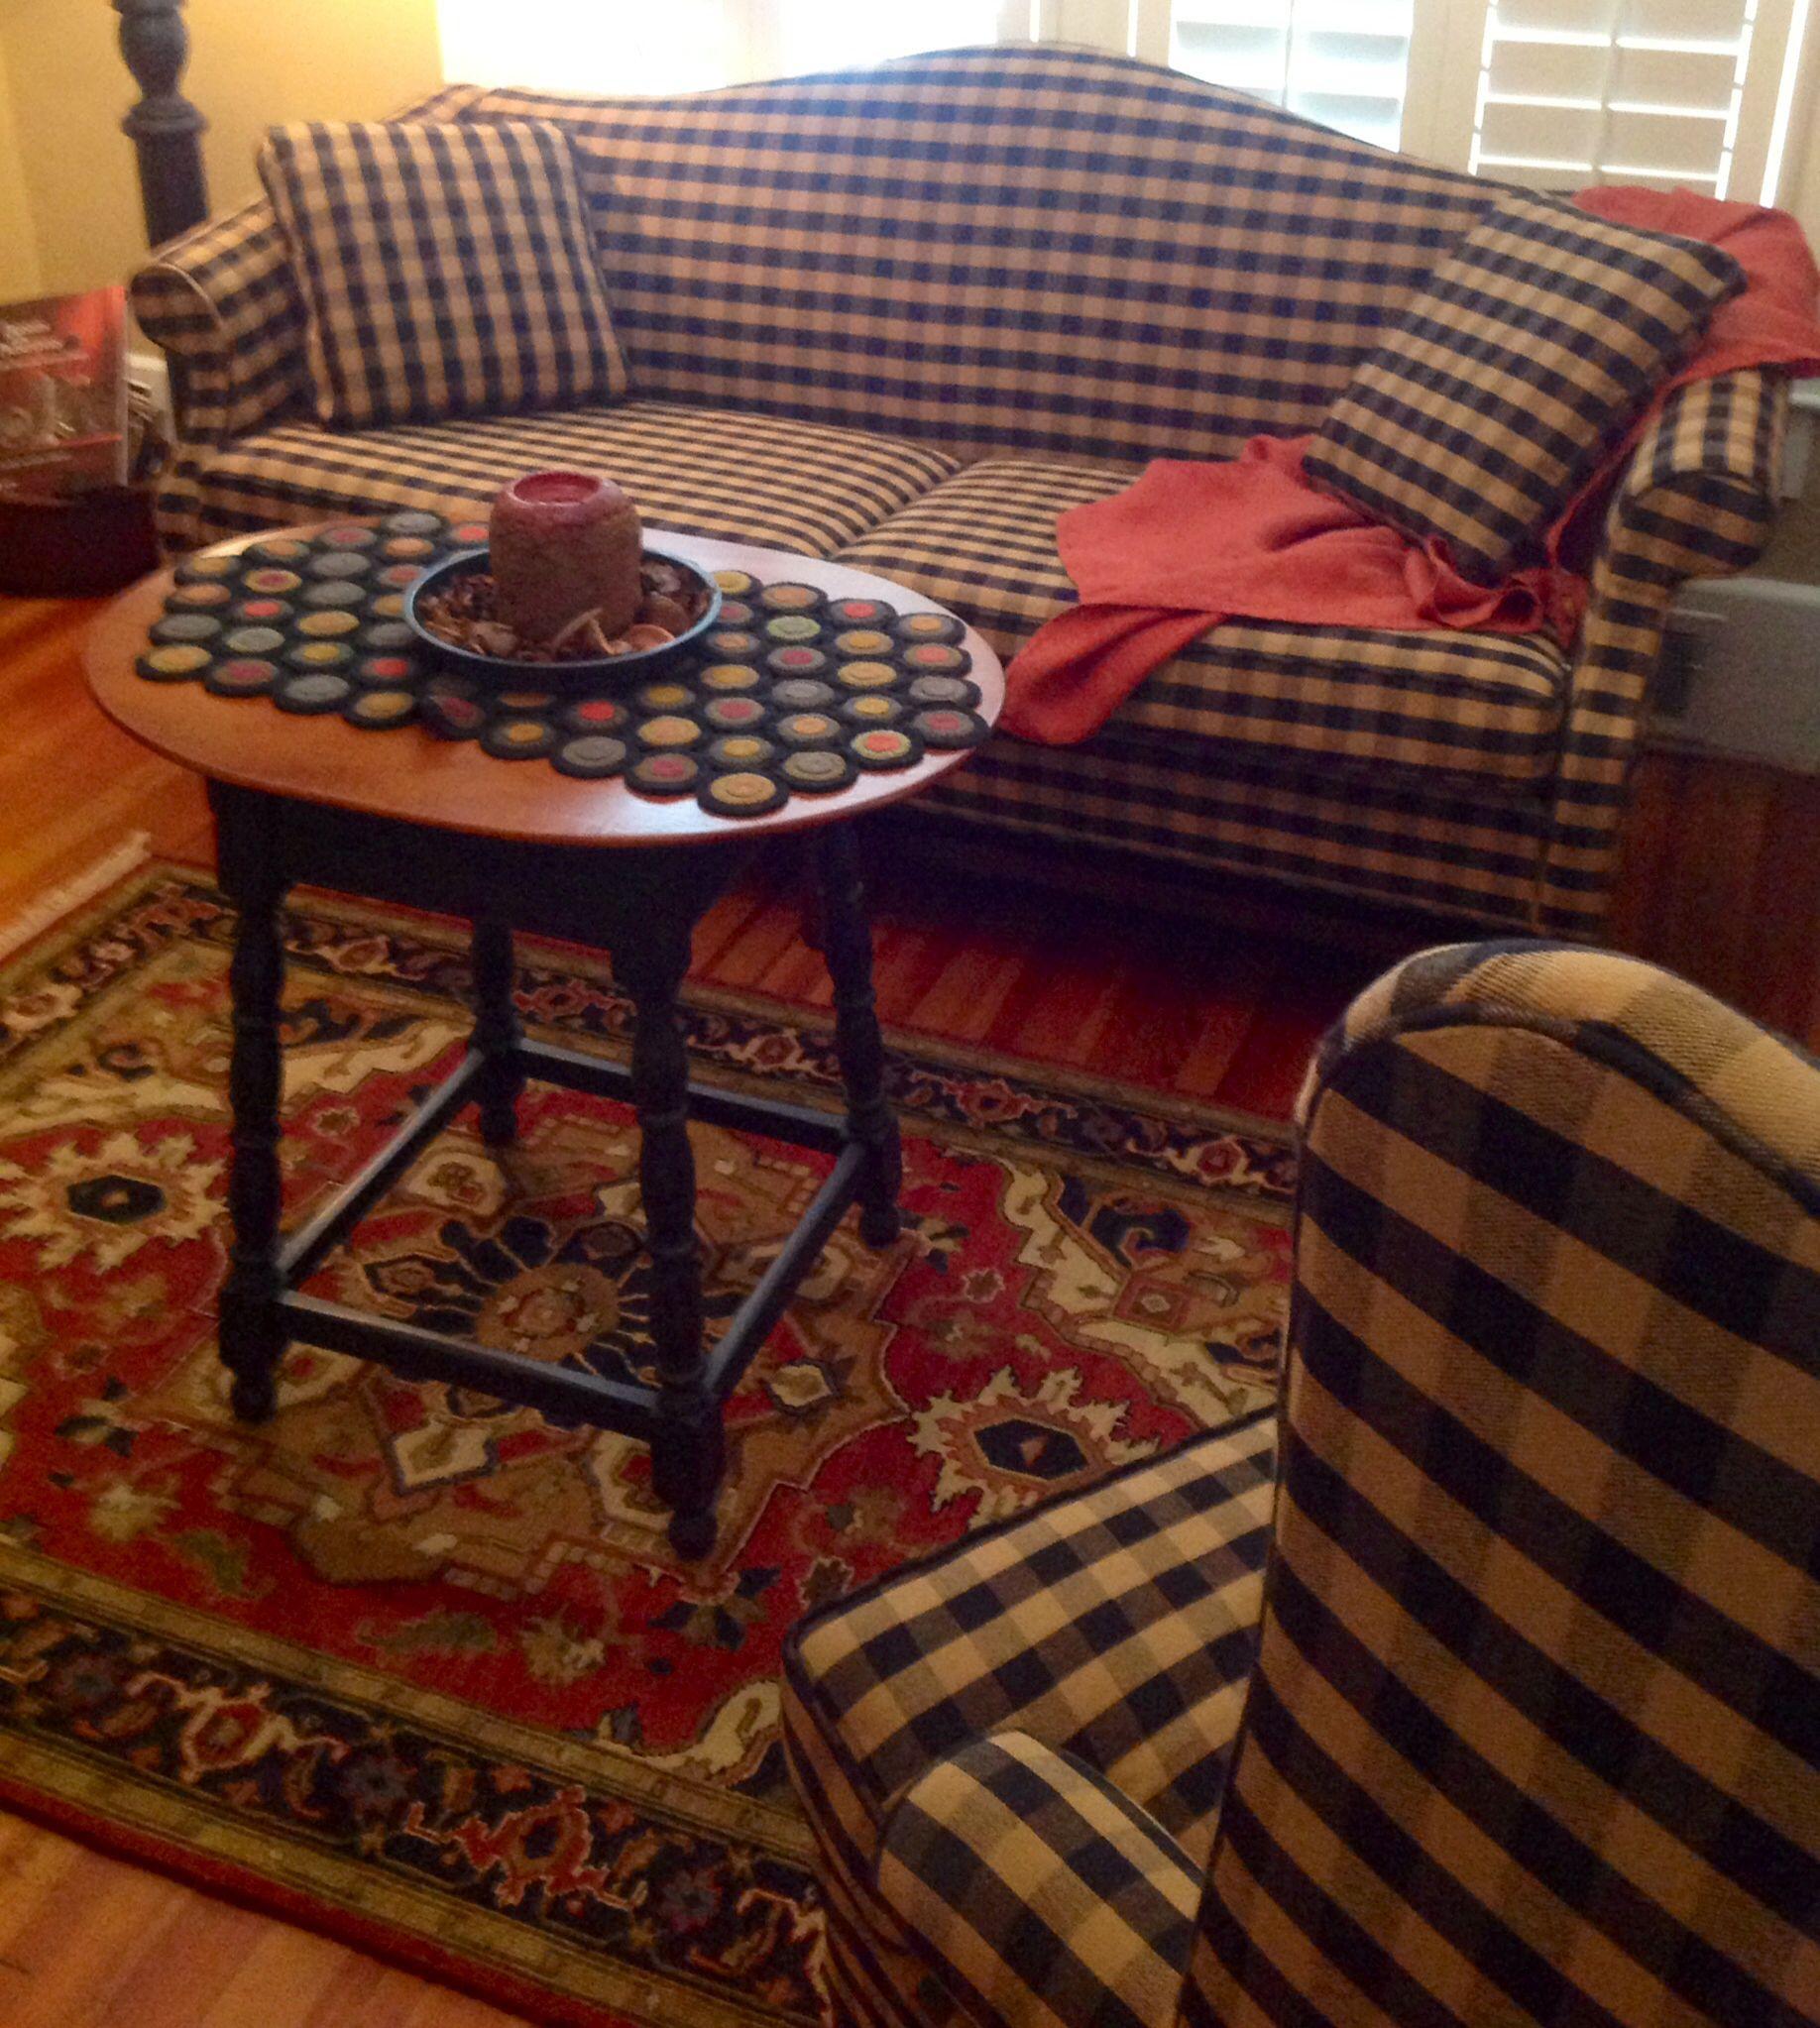 country primitive sofa tables modern tufted leather kathleen joye prim decor rooms pinterest primitives